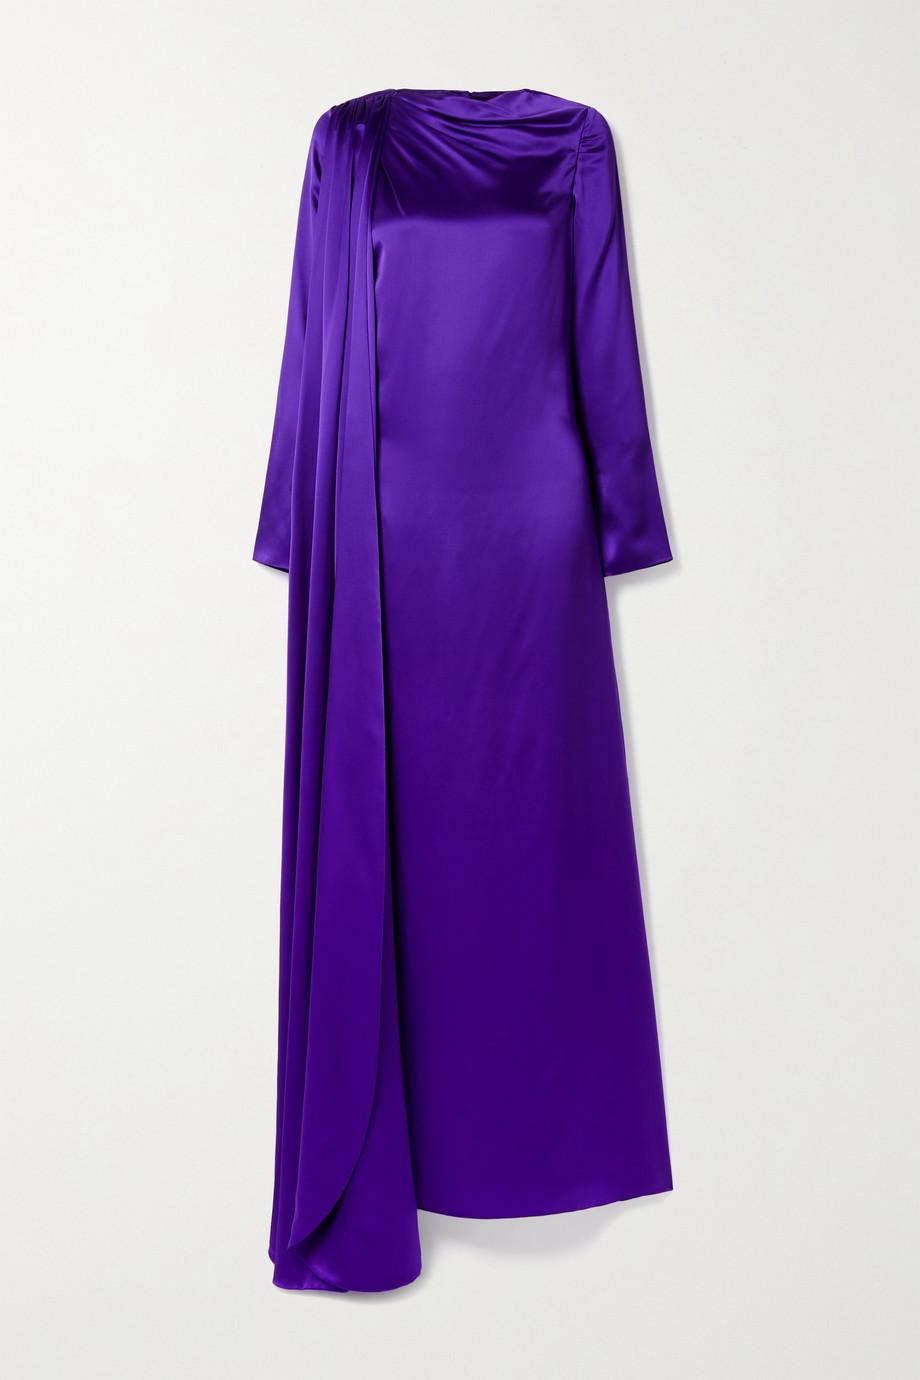 Christopher John Rogers Open-back draped silk-charmeuse gown